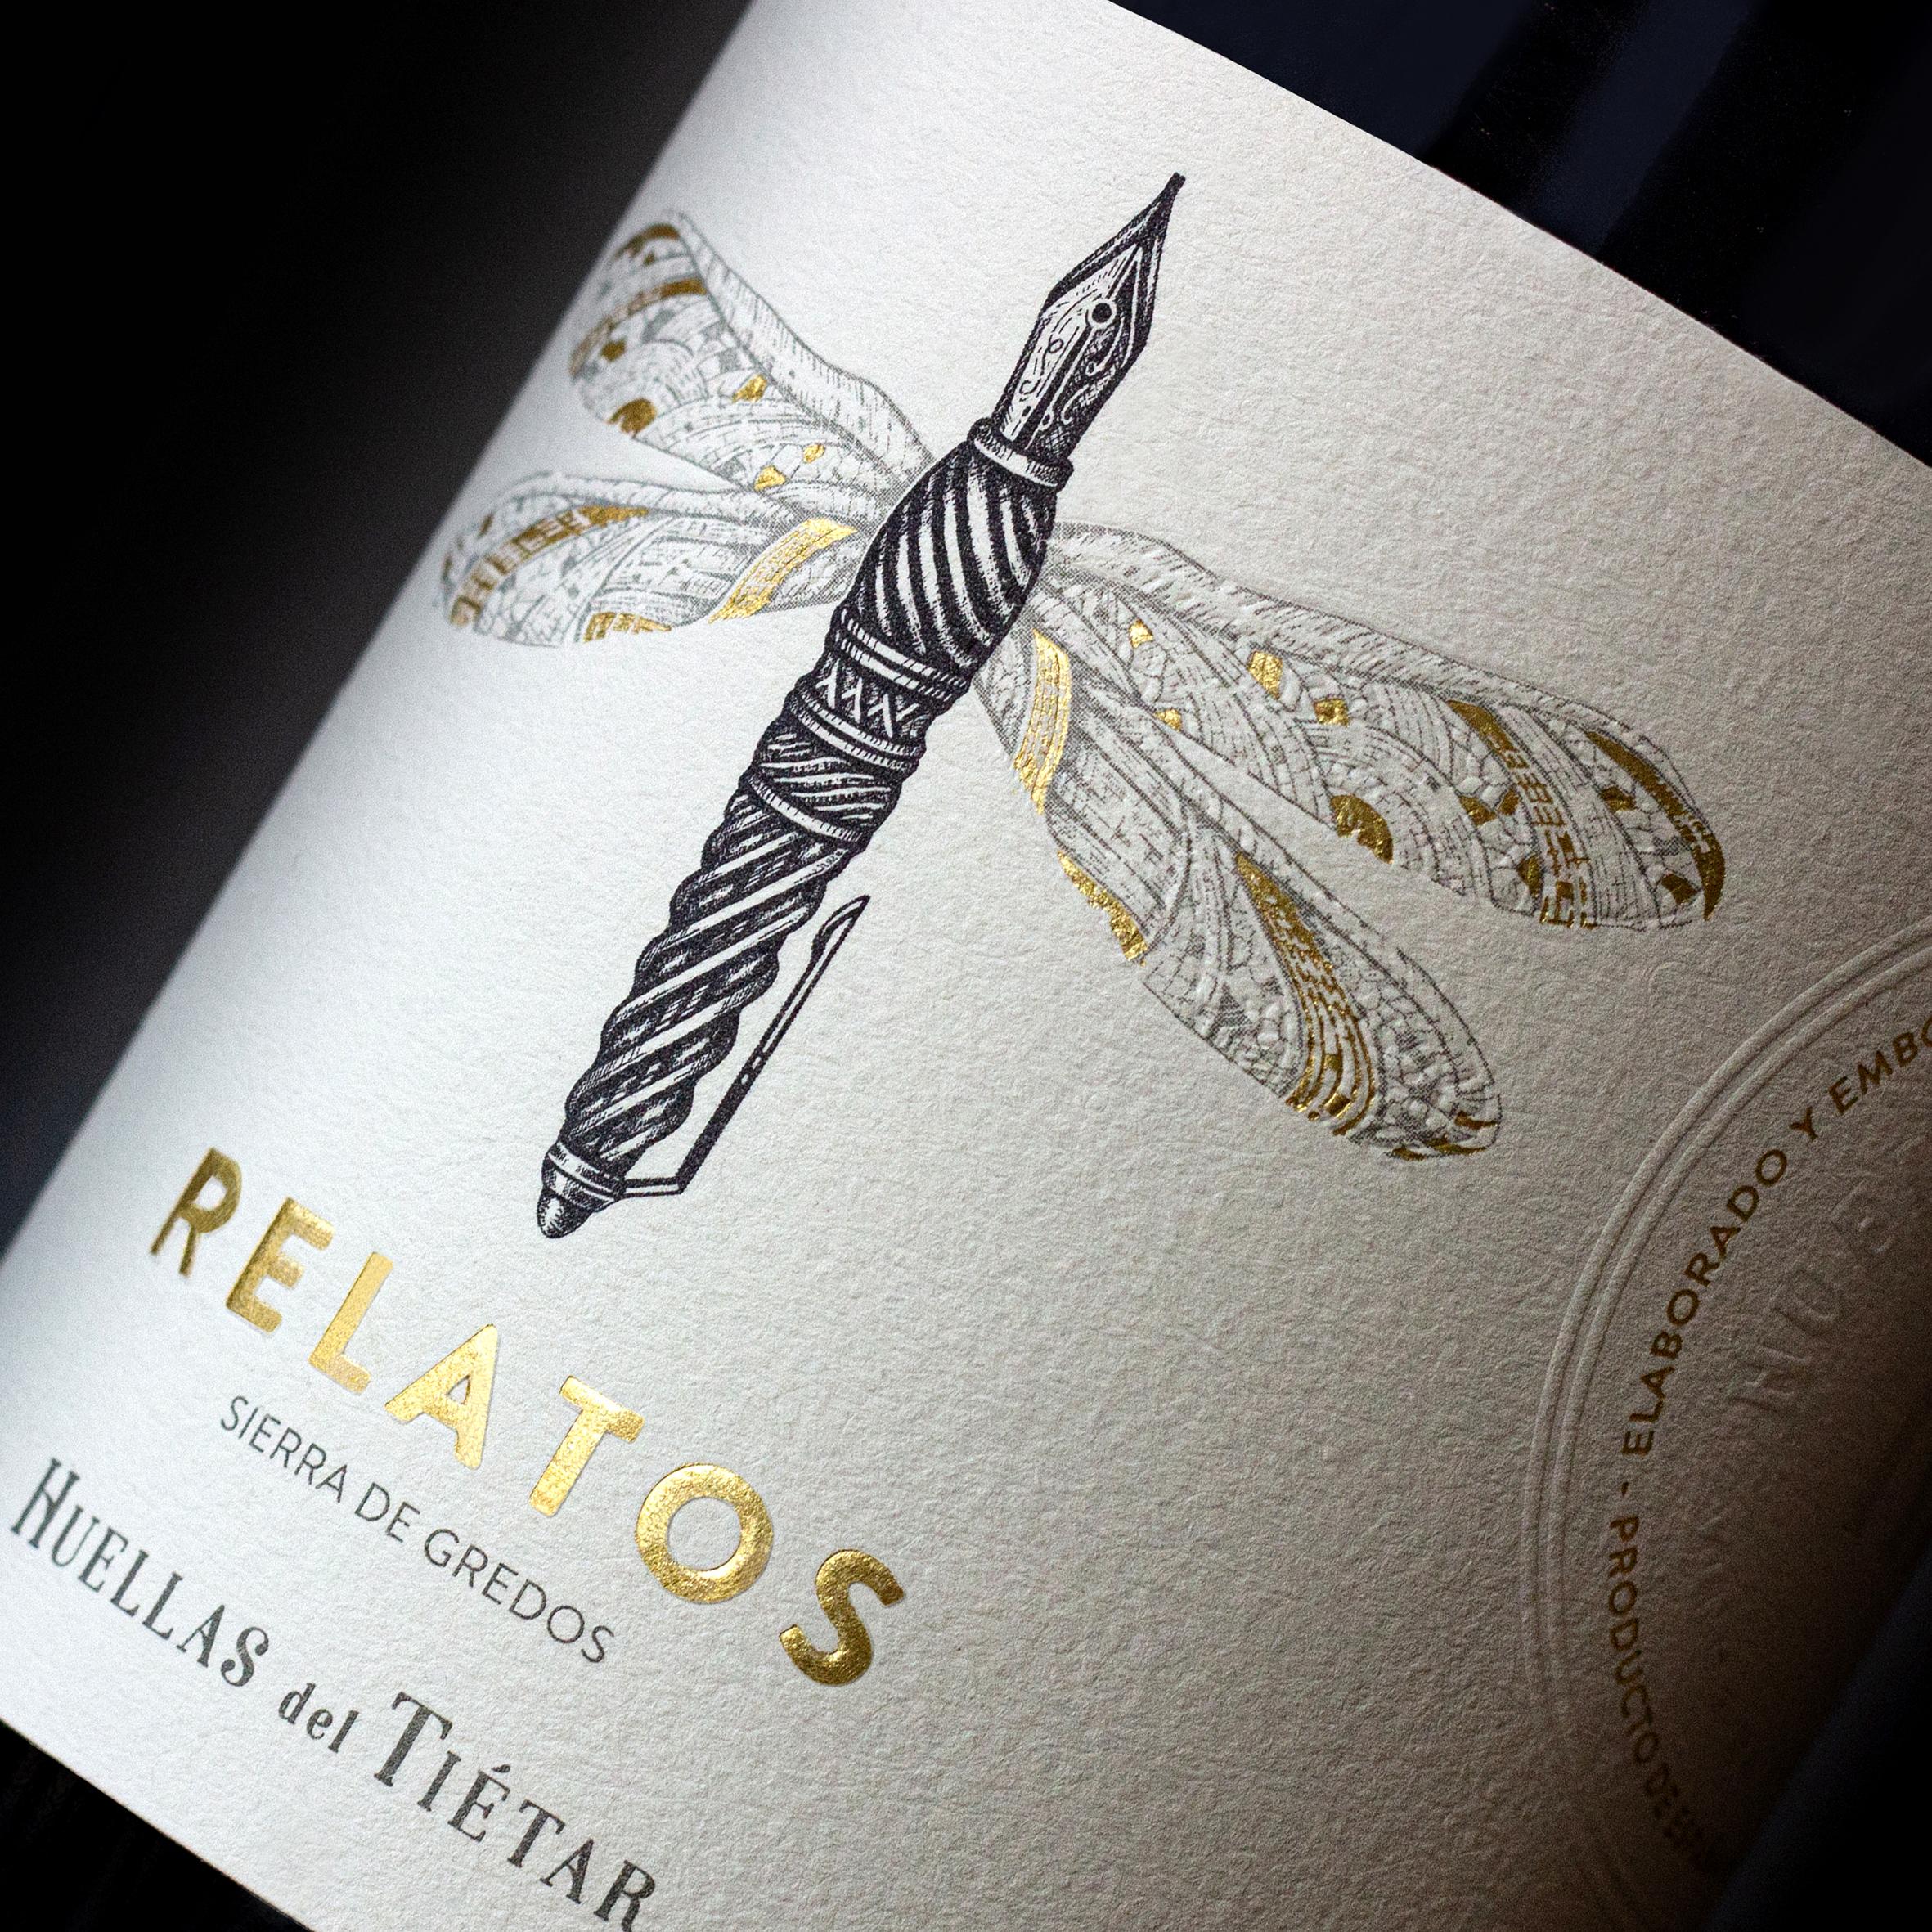 RELATOS Poetry and Wine